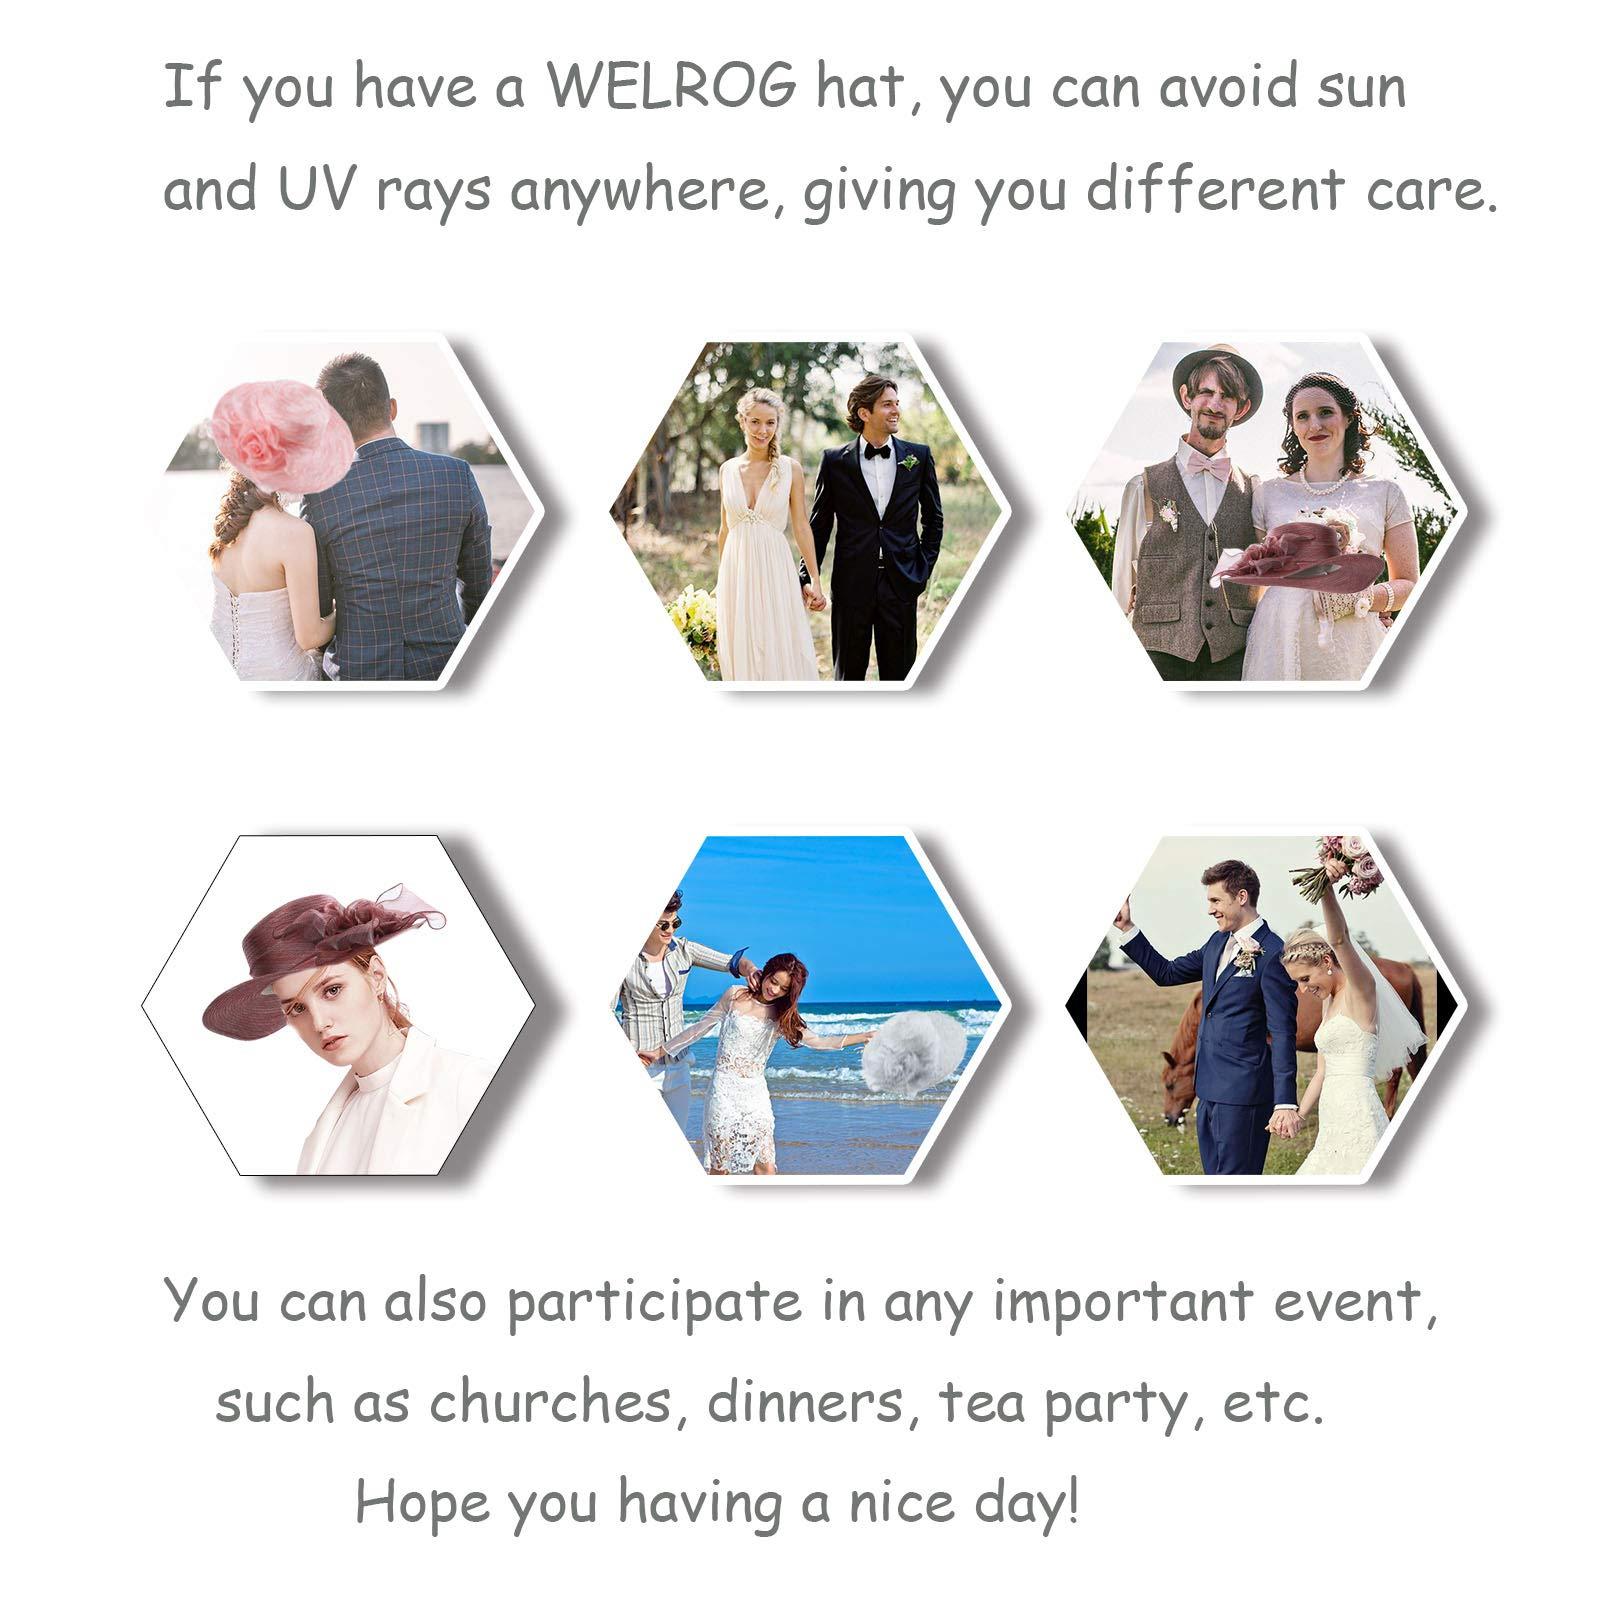 WELROG Women's Derby Church Dress Hat - Wide Brim Floppy Floral Ribbon UPF Protection Wedding Sun Hats(Navy Blue) by WELROG (Image #7)